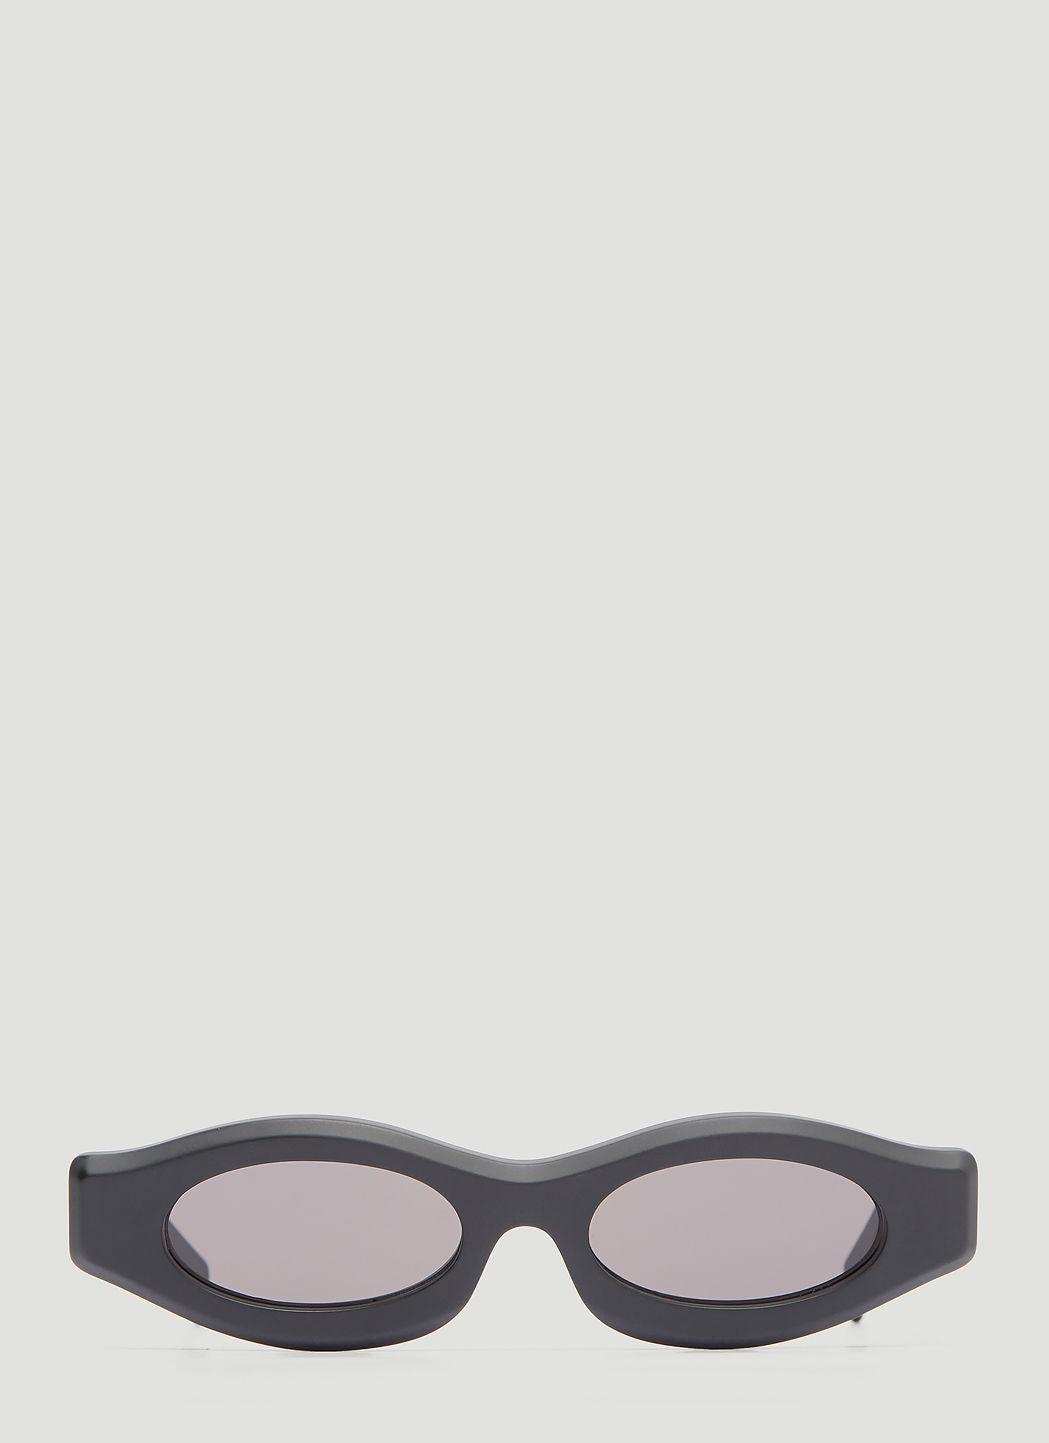 72d79b0a3882 Kuboraum Maske Y3 Slim Matt Sunglasses In Black | ModeSens